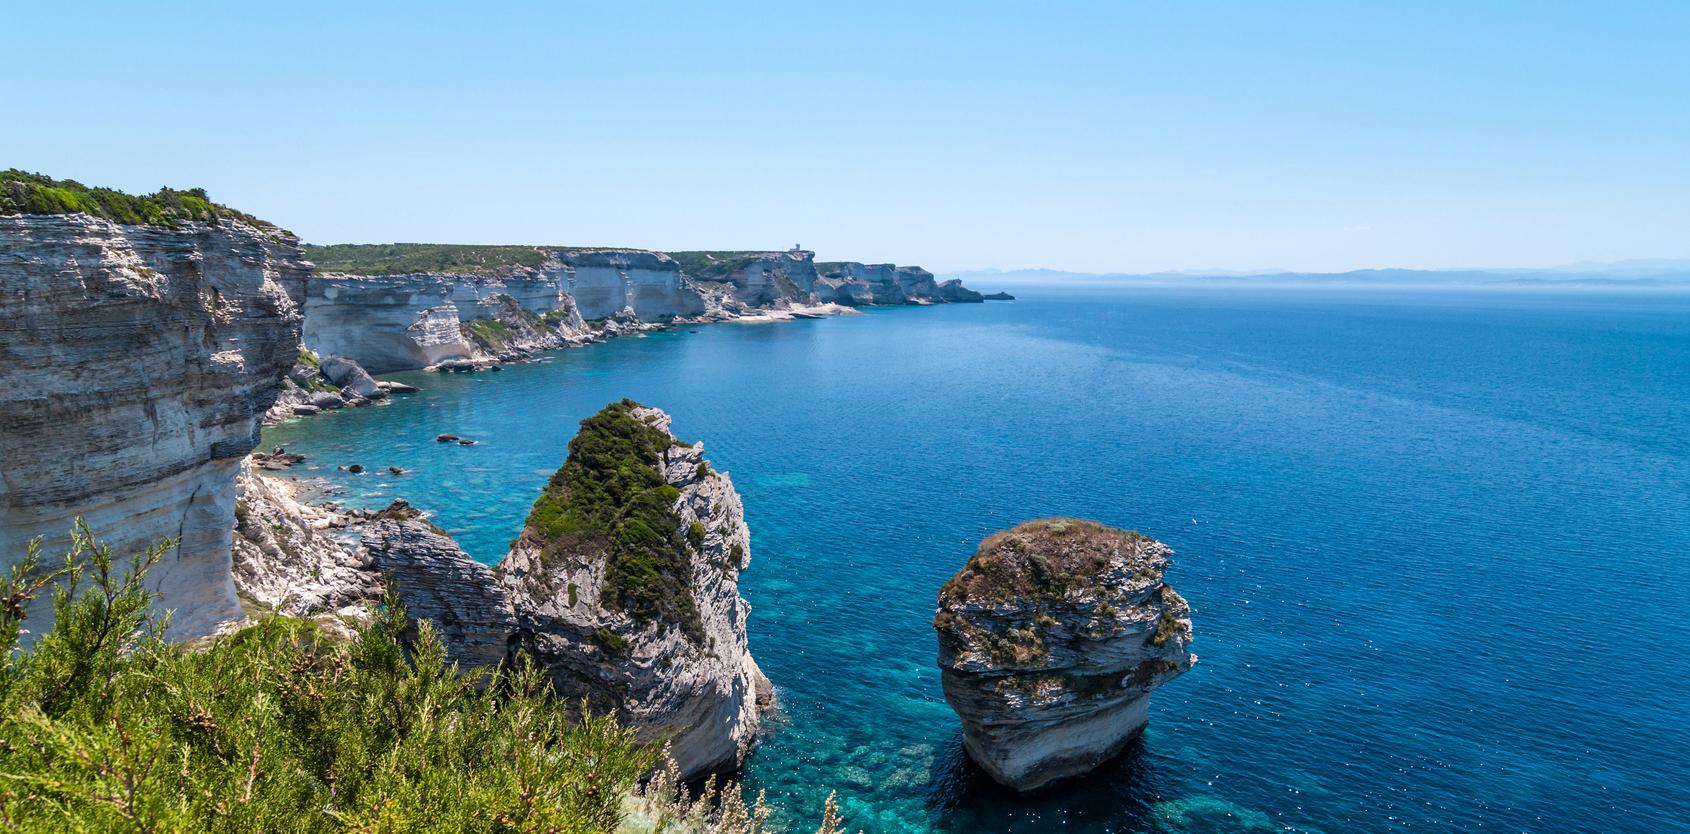 Франция (Средиземное море)